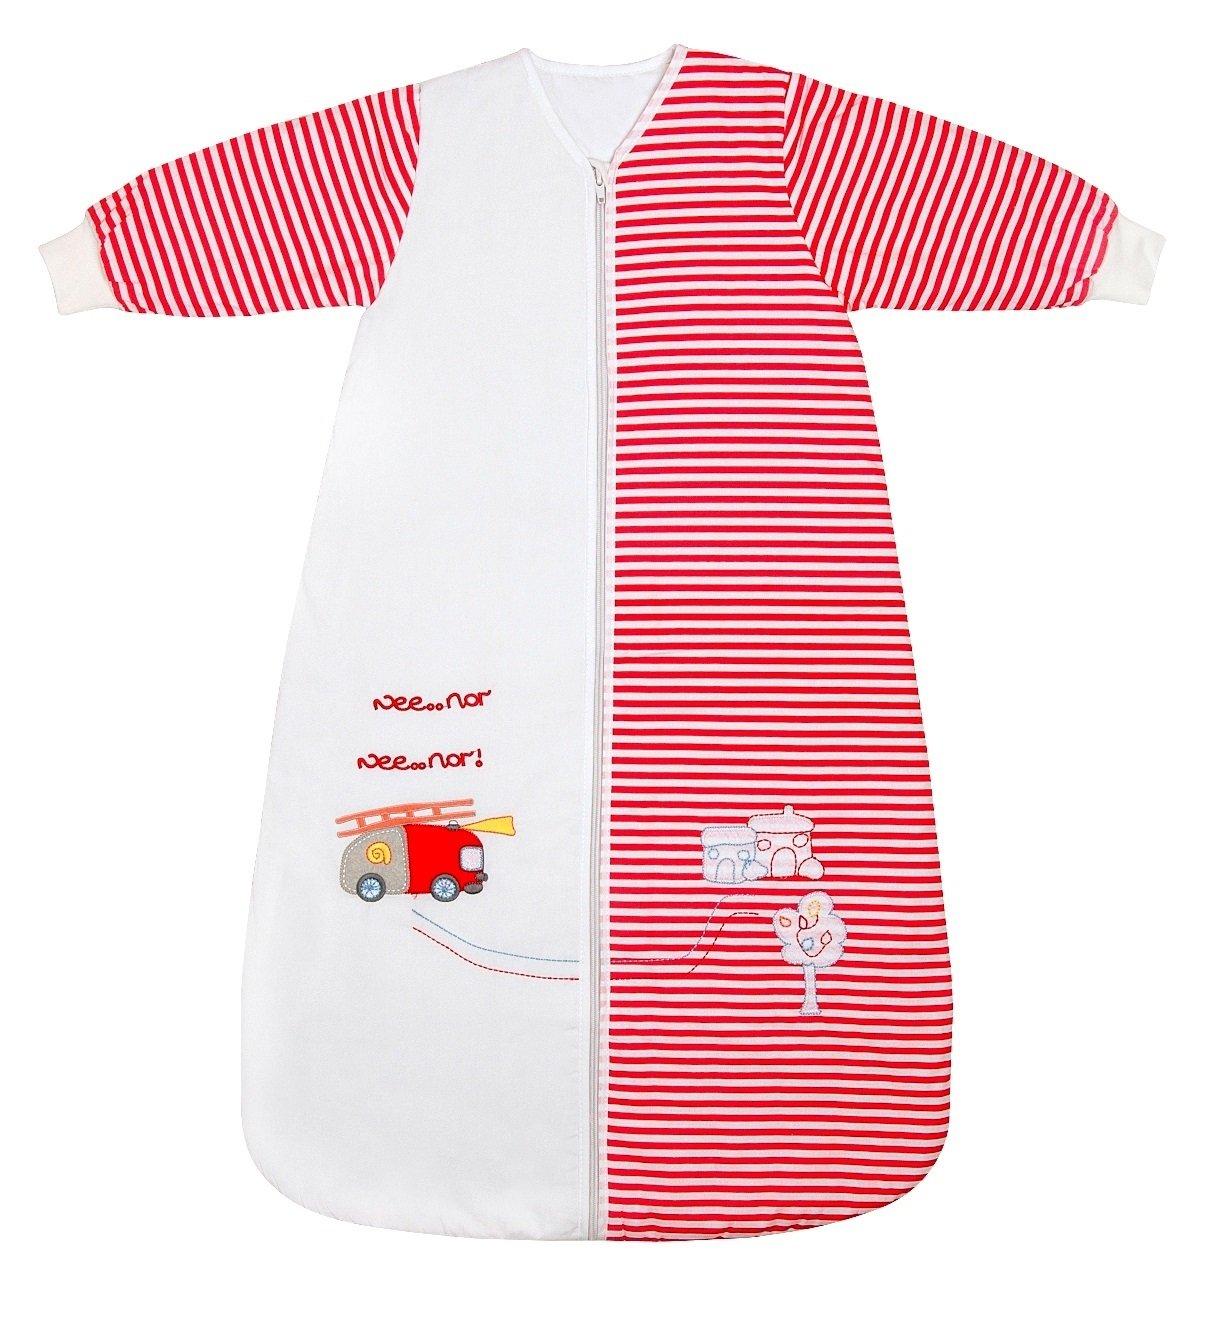 Amazon.com: SlumberSafe Winter Baby Sleeping Bag Long Sleeves 3.5 Tog Fire Egine 0-6months/SMALL: Baby